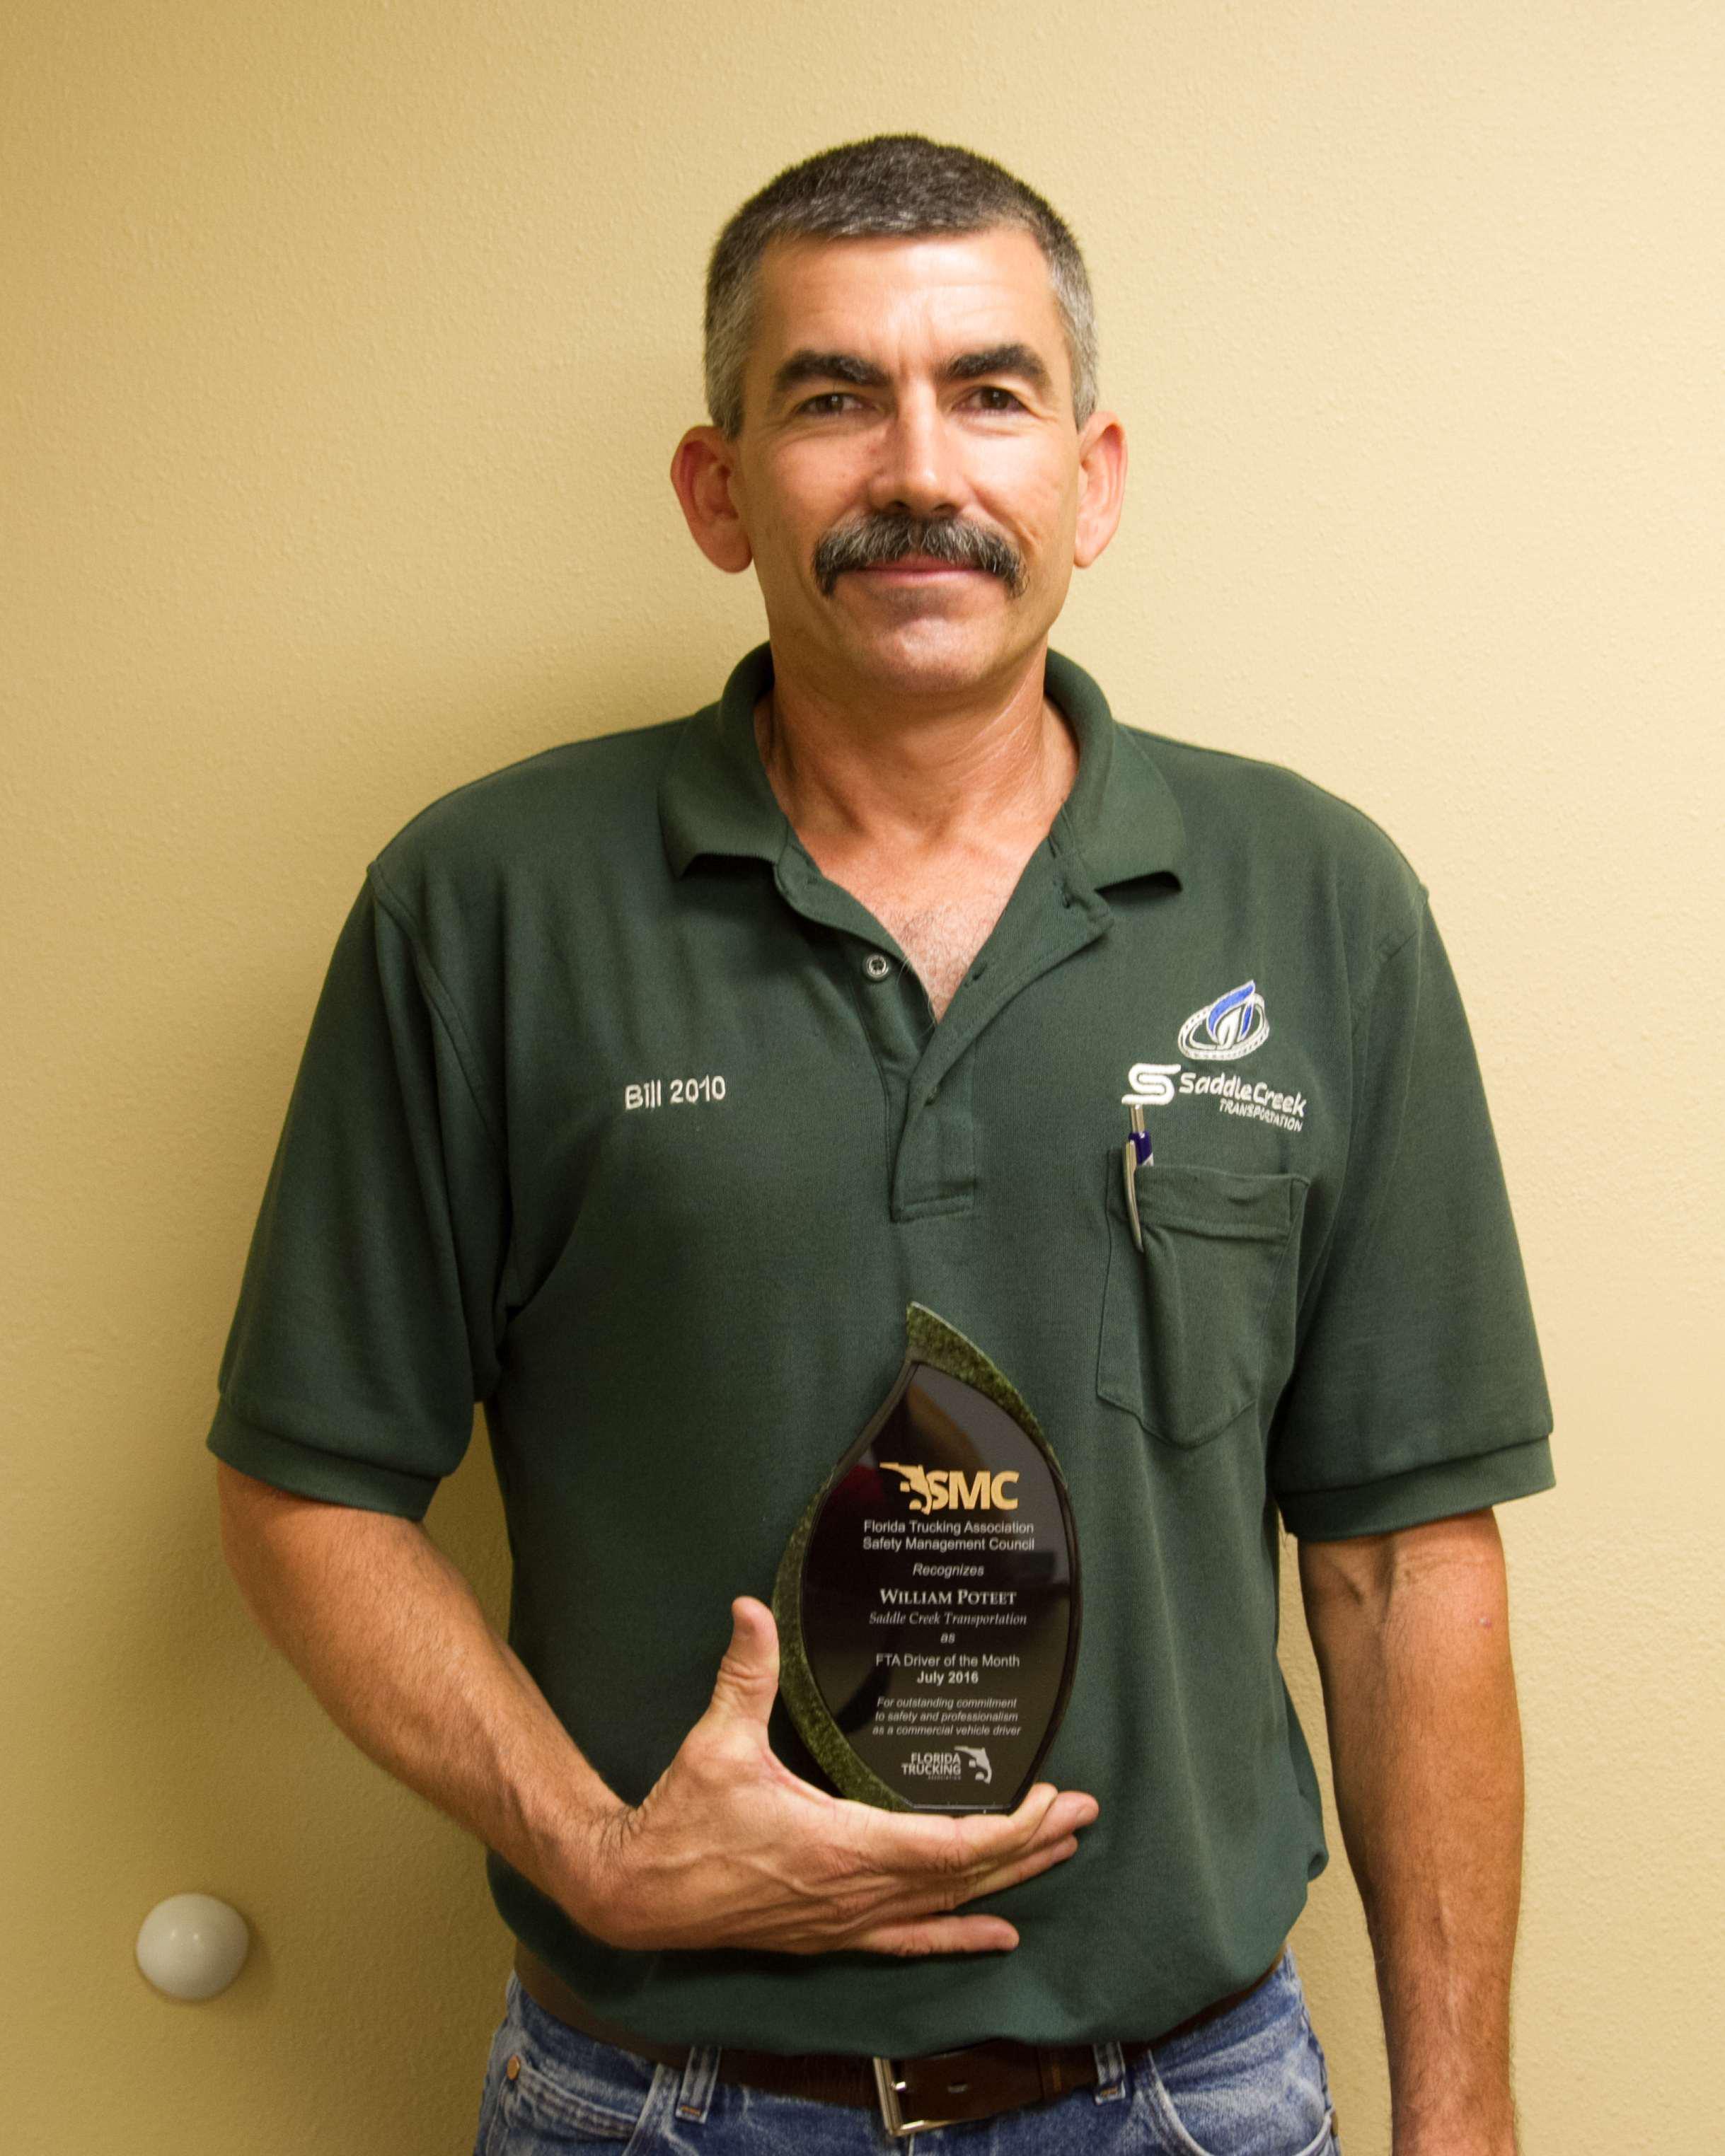 William Poteet, driver for Saddle Creek Transportation